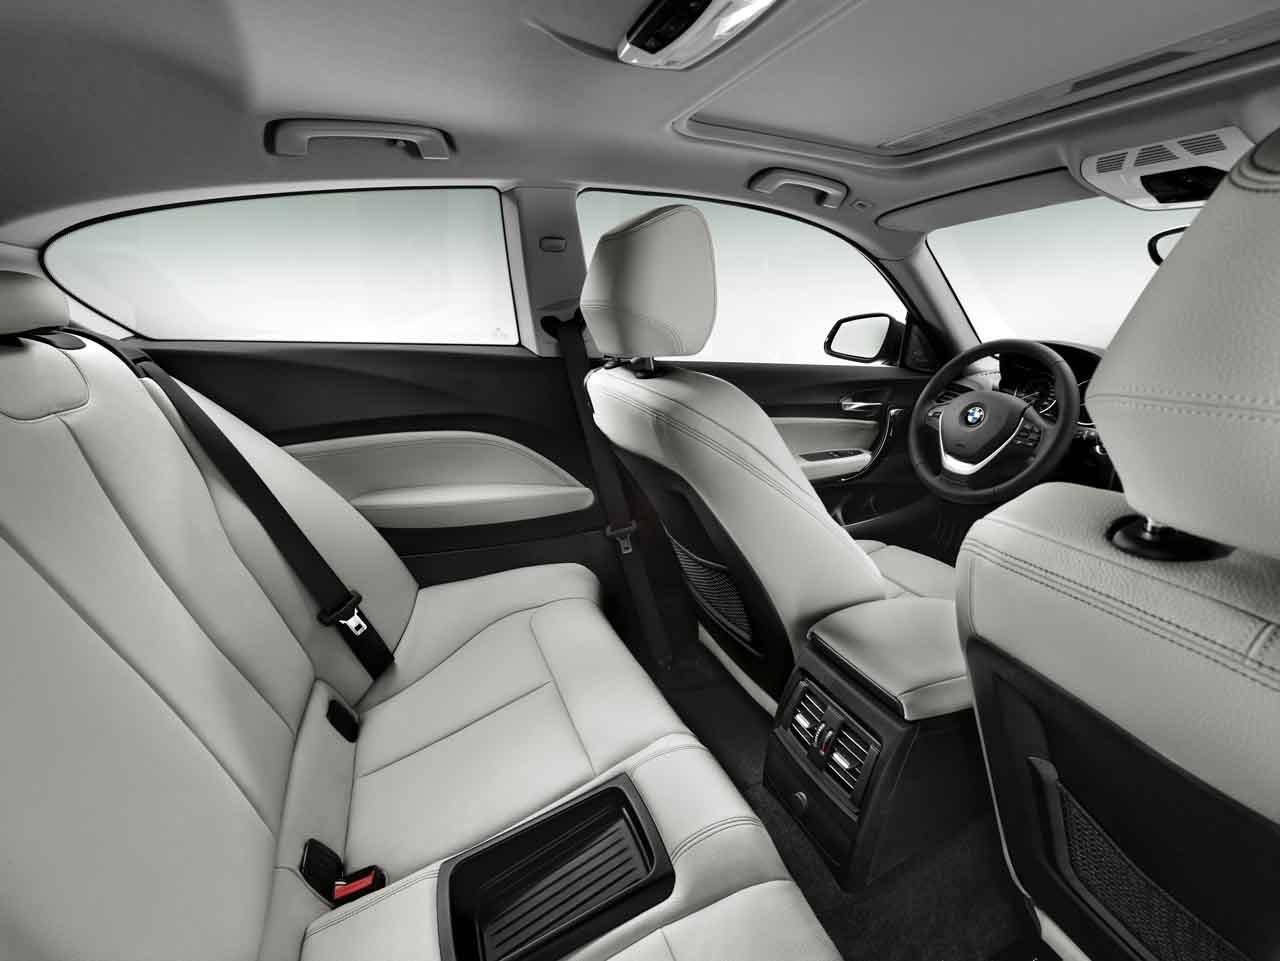 bmw three-door 1 series - interior - car body design